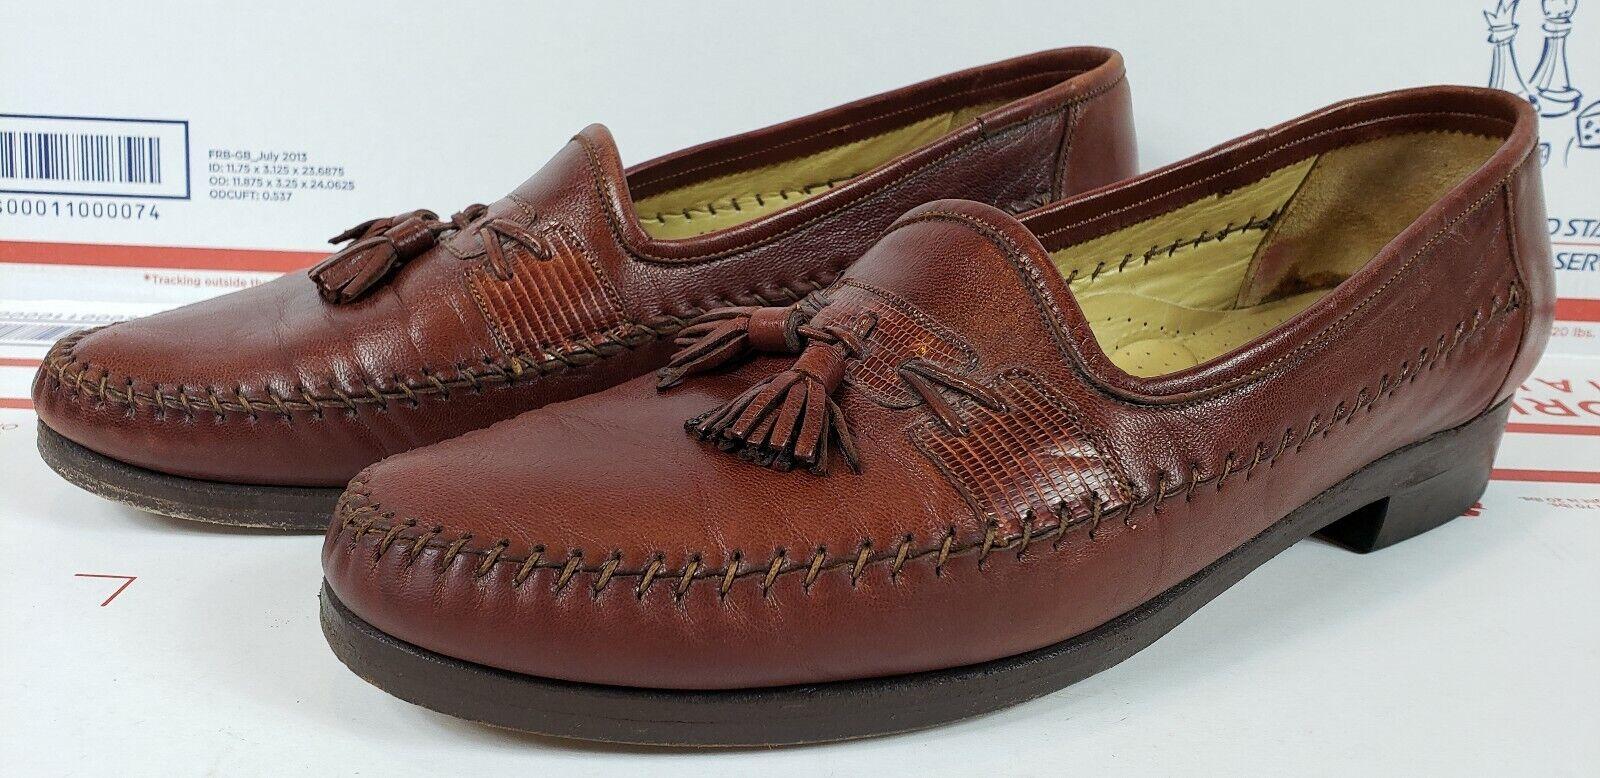 Homme marron ITALY IN MADE Chaussures Slip on Tassel cuir en